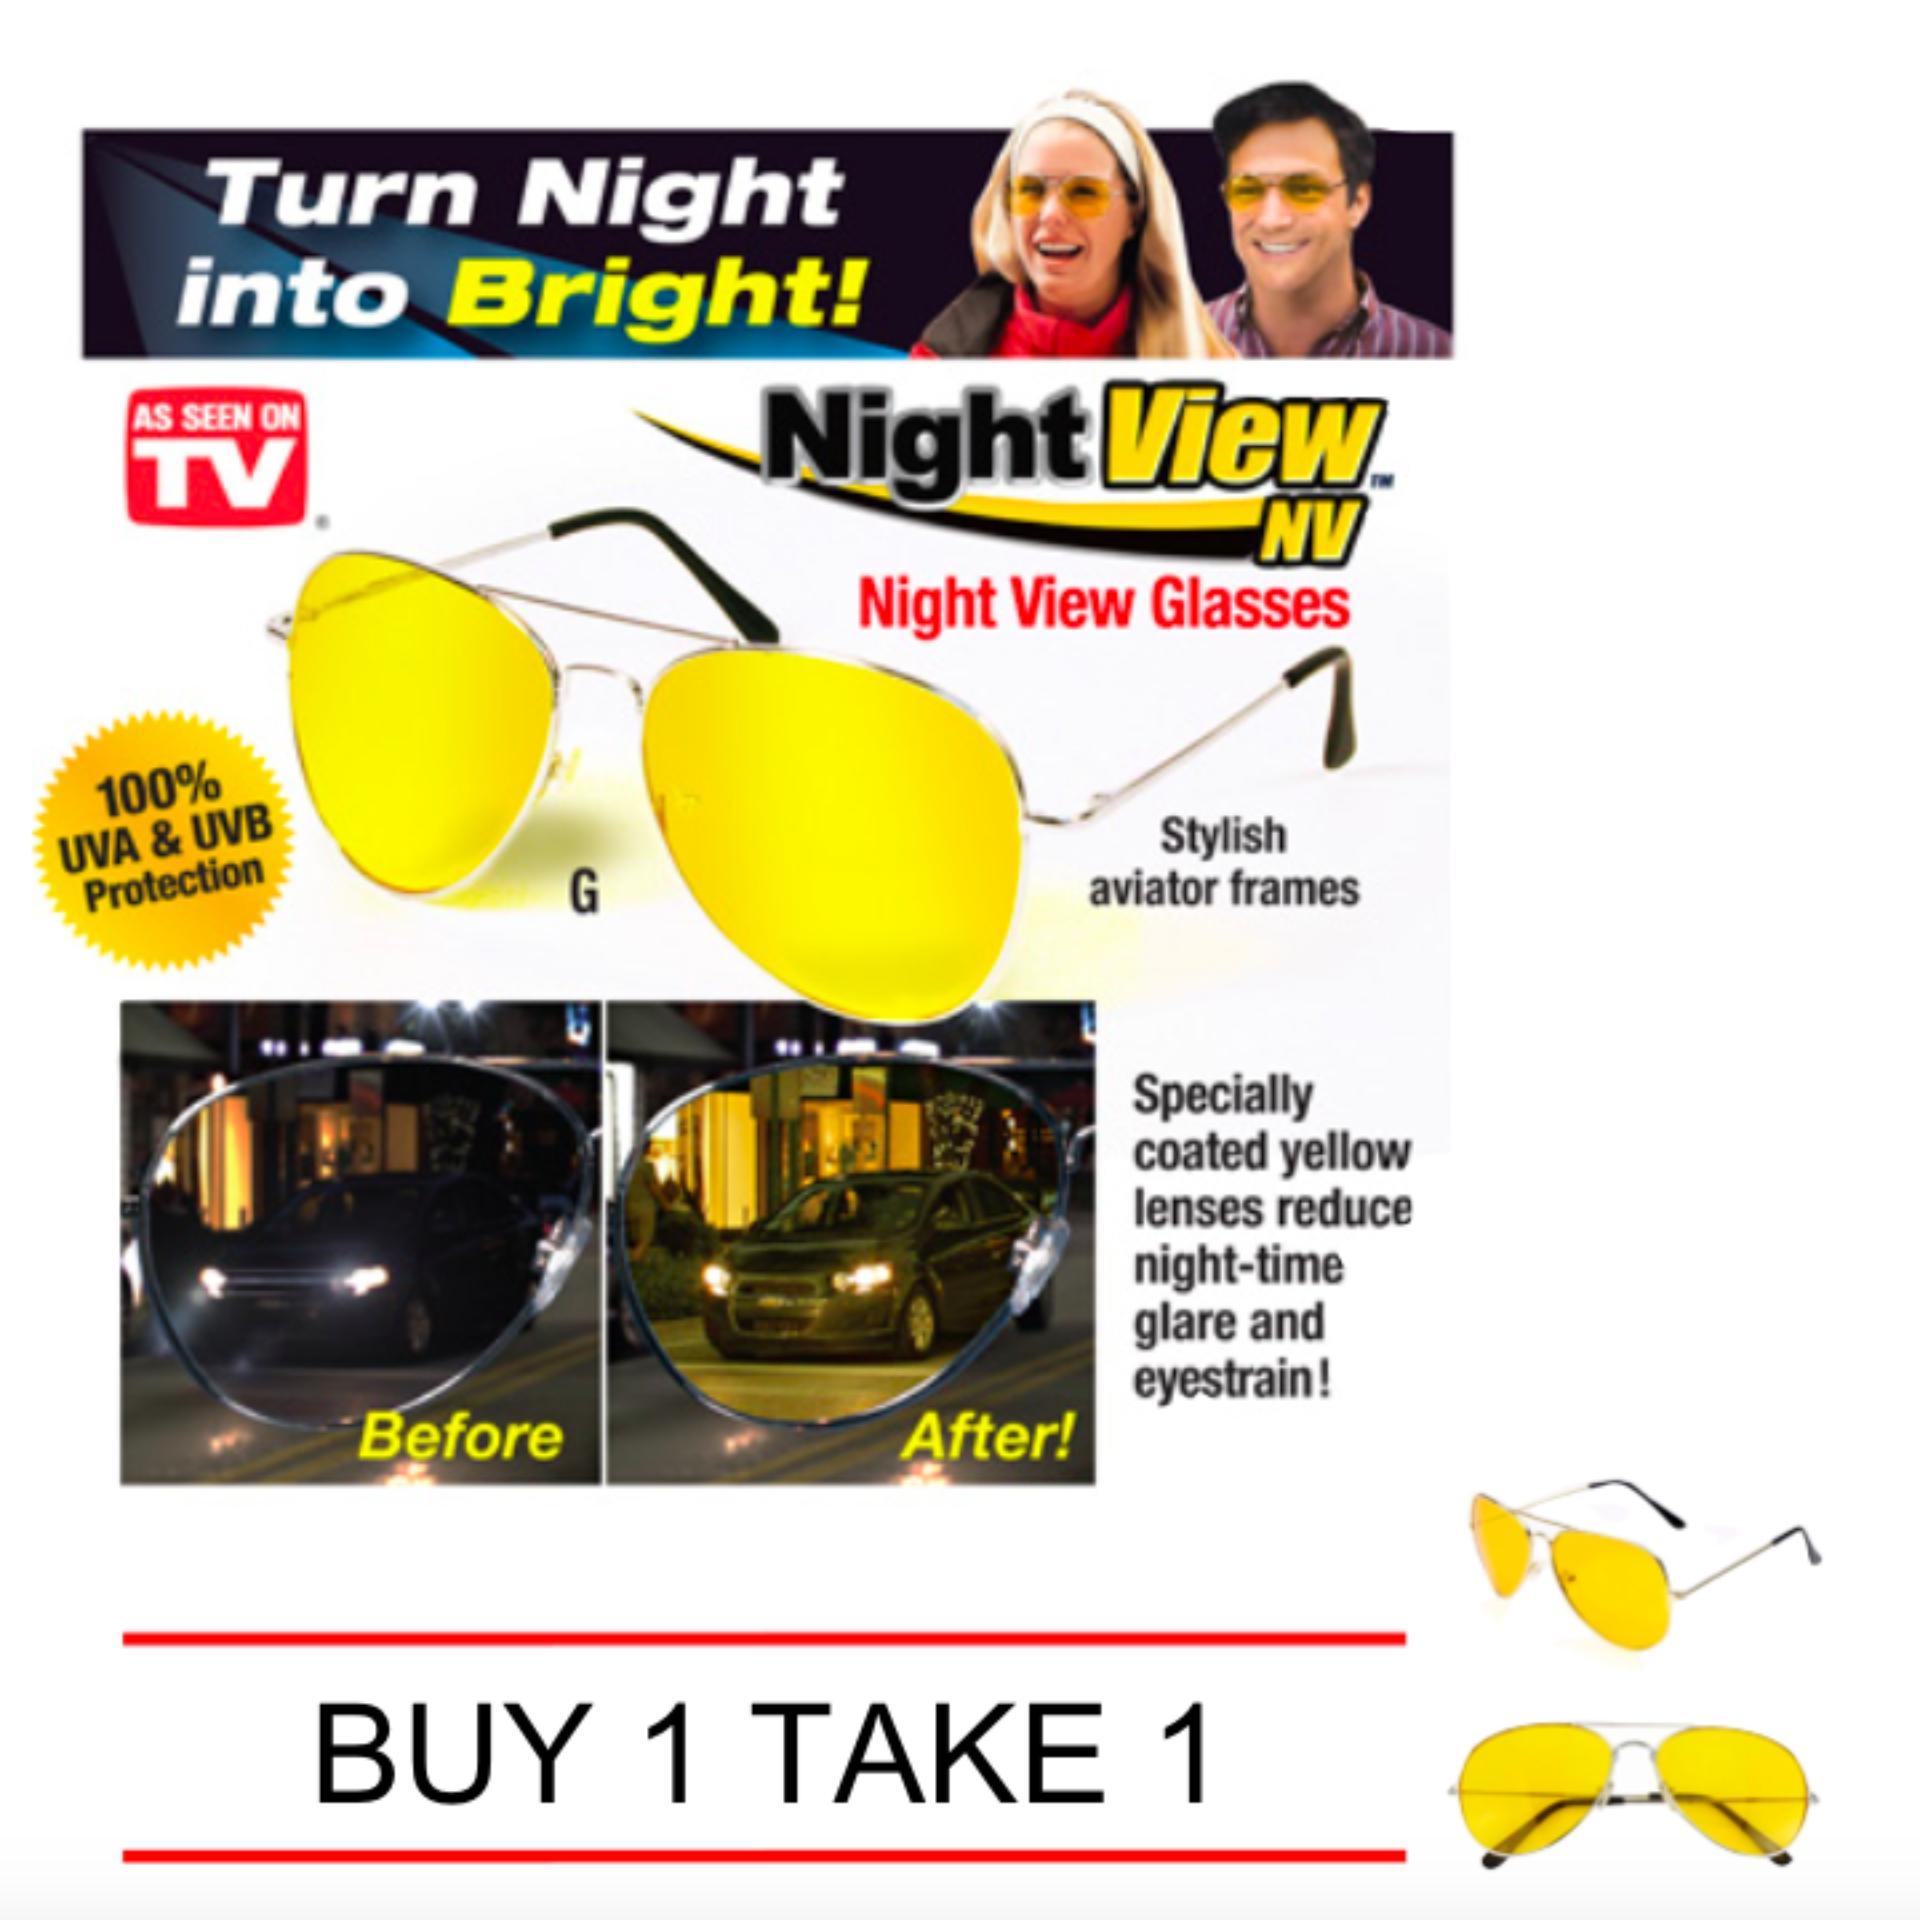 caa05cbd041 Night View NV Anti Glare Night Vision Aviator-Driving Glasses Buy 1 Take 1